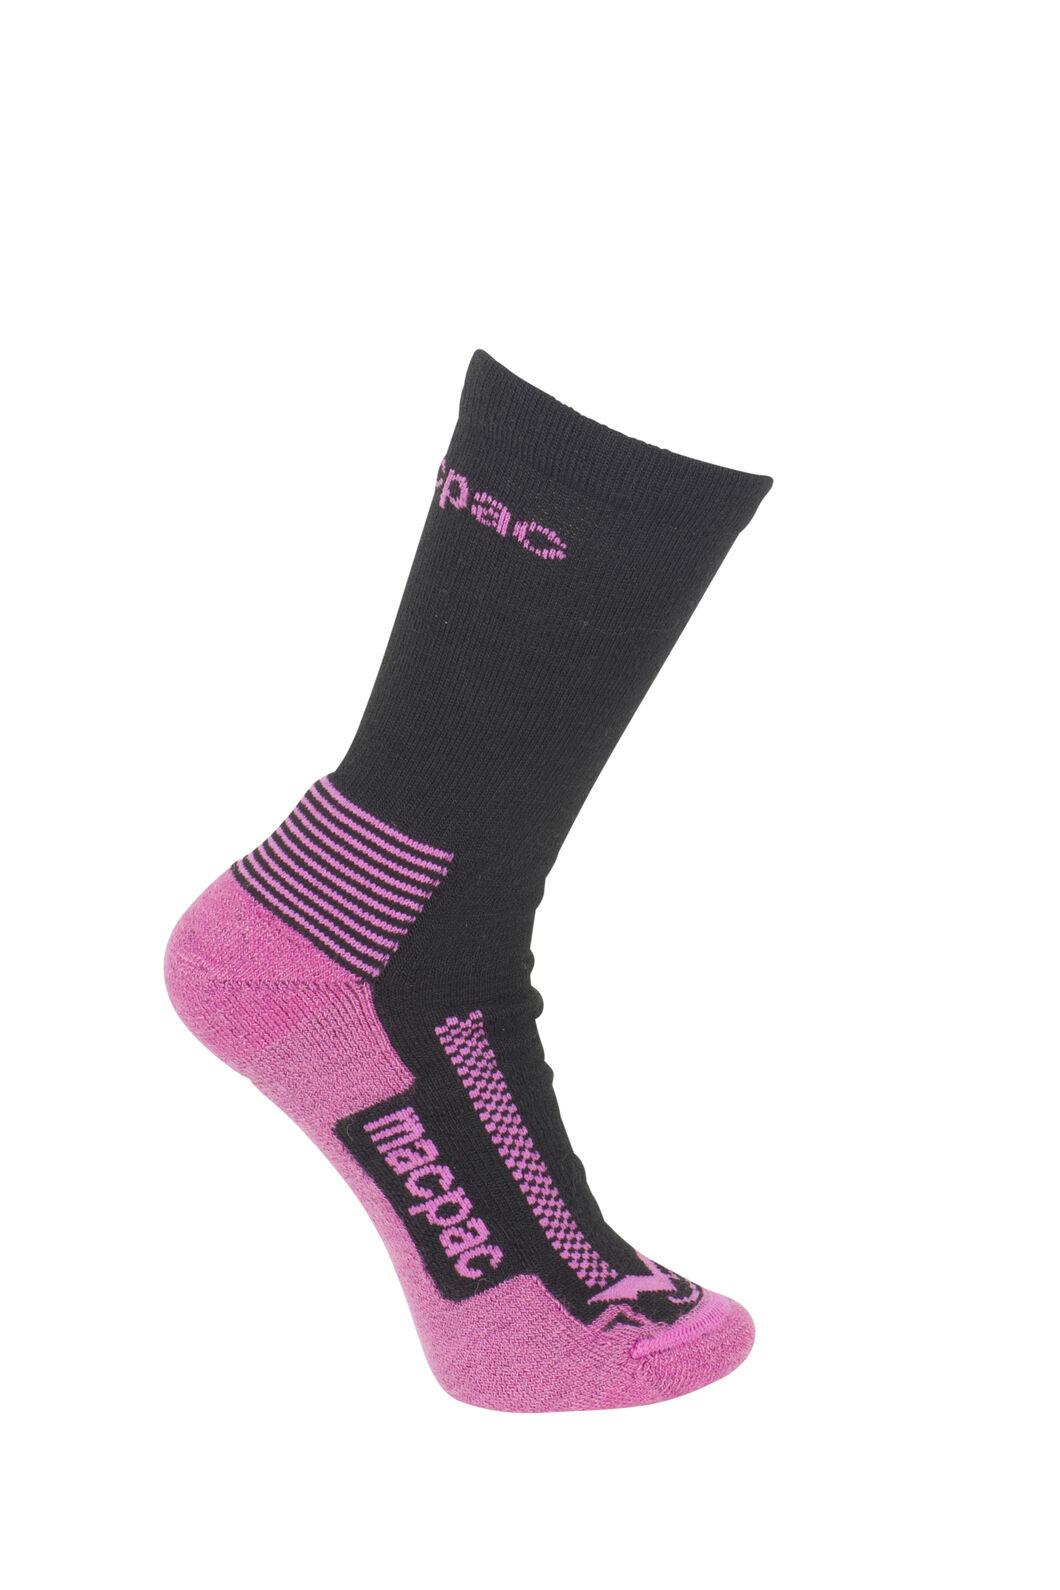 Macpac Trekking Socks - Kids', Black/Pink, hi-res